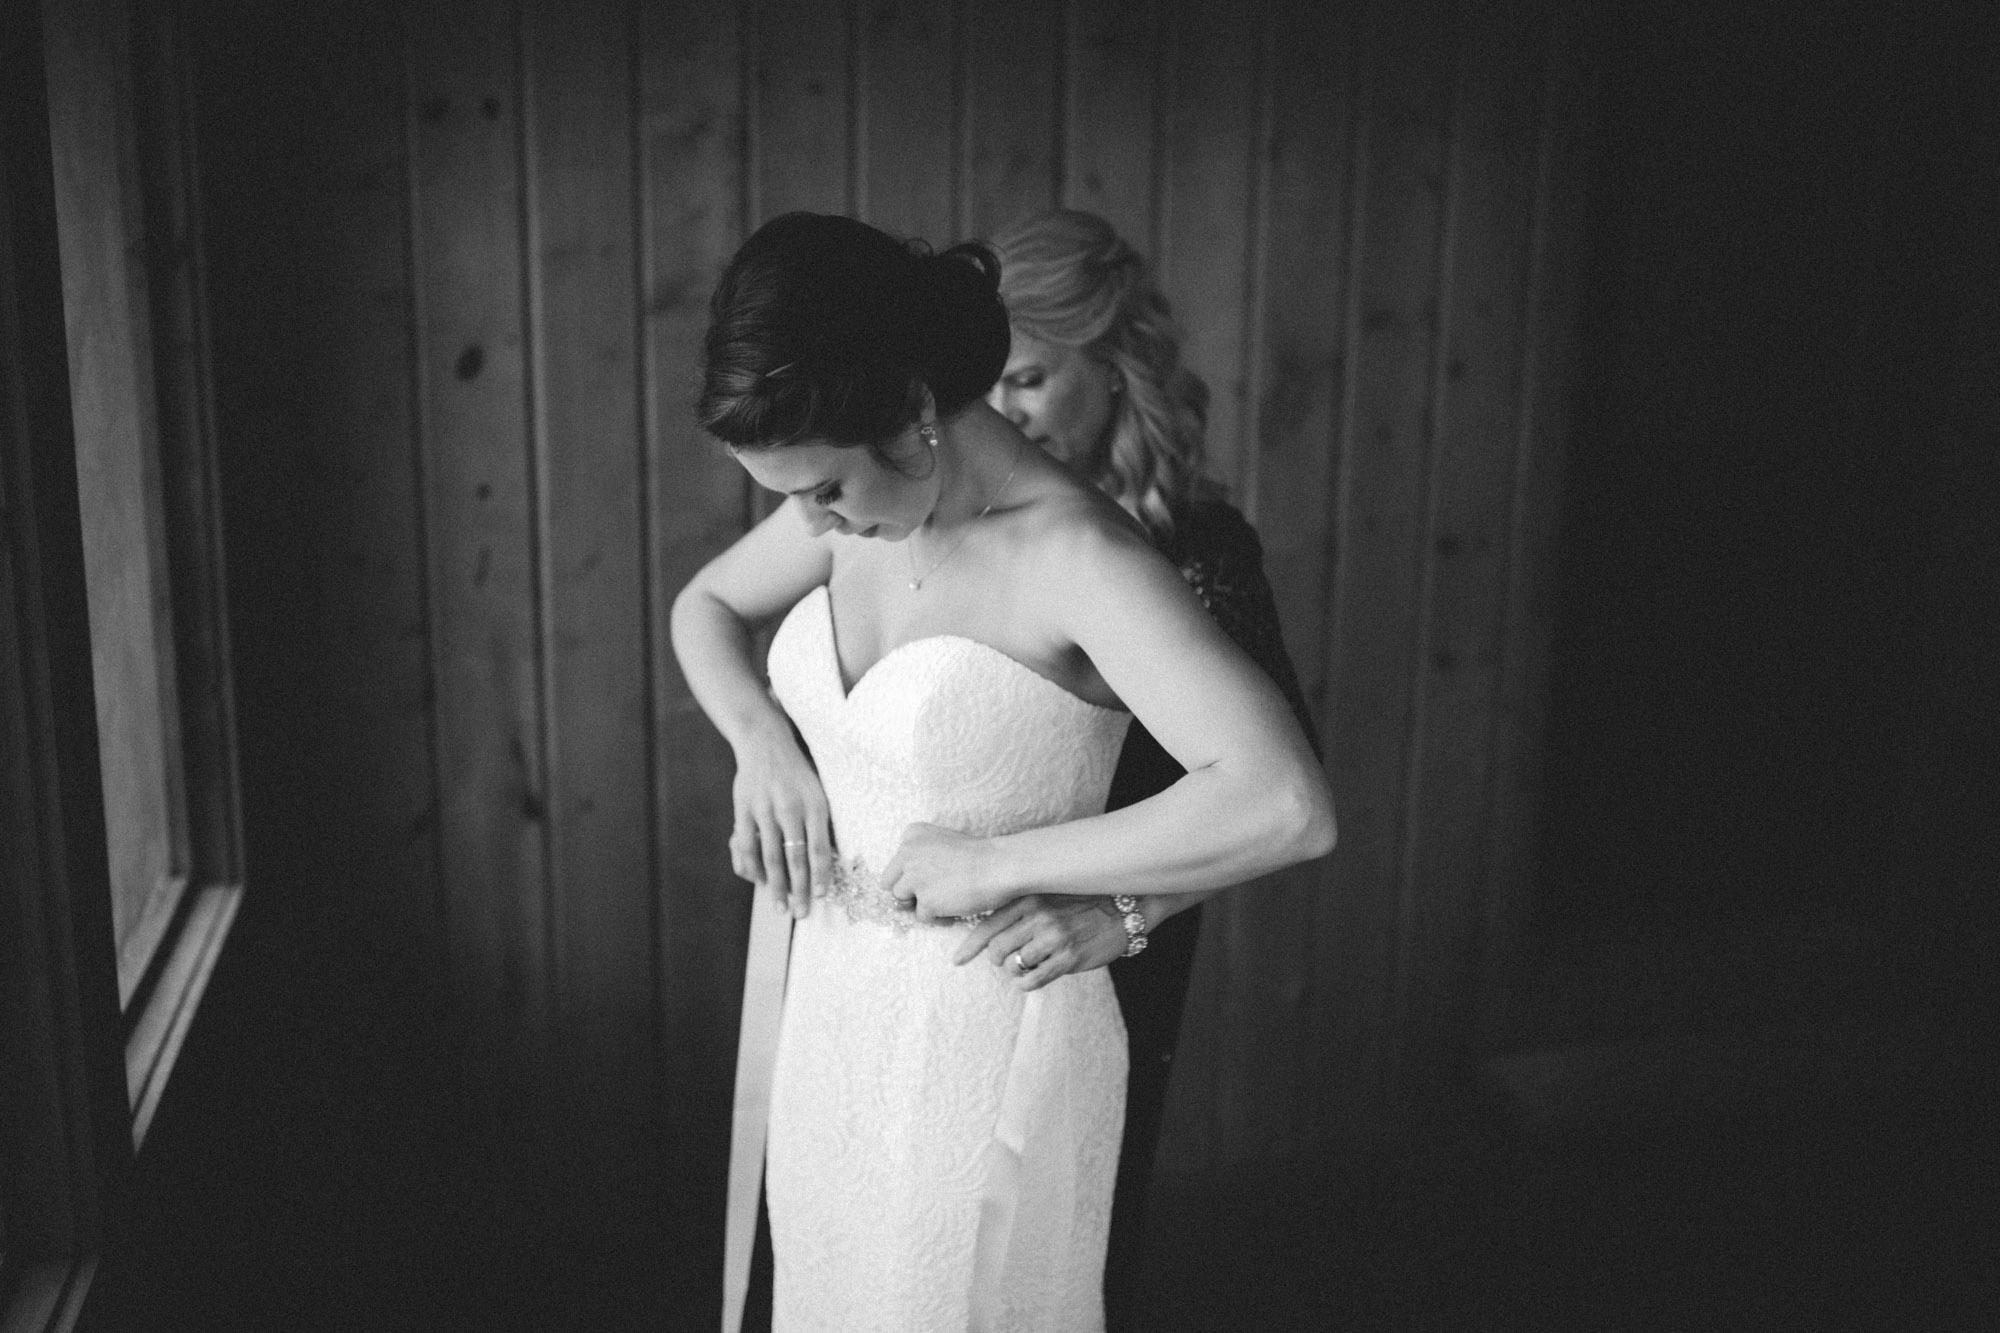 Black and white wedding photo inspiration. Photography by Britt DeZeeuw, Grand View Lodge Nisswa Minnesota top wedding photographer.